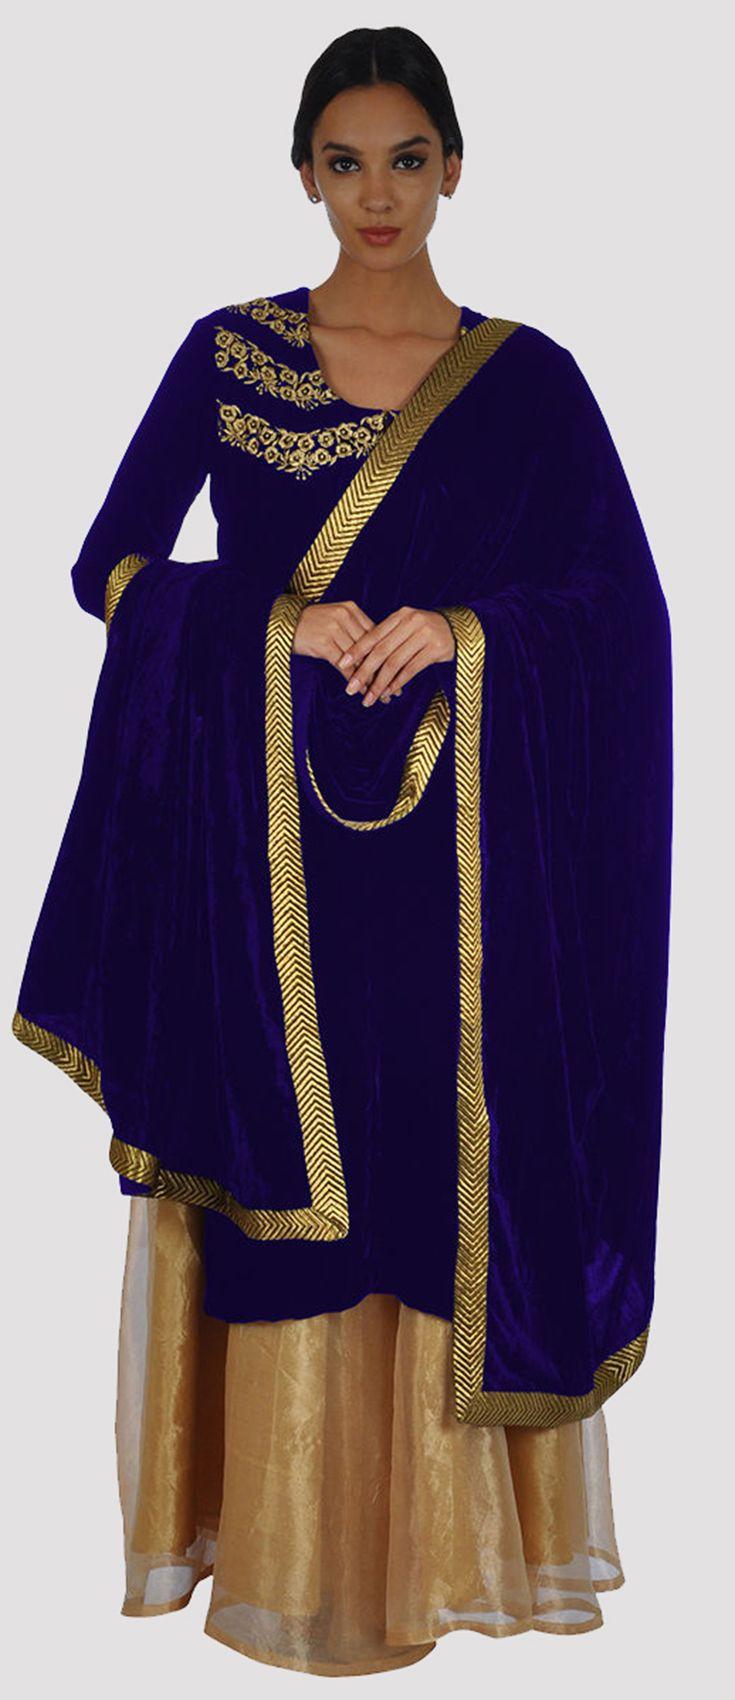 Electric Blue Silk-Velvet Zari Kurta With Gold Pure Tissue Skirt And Dupatta